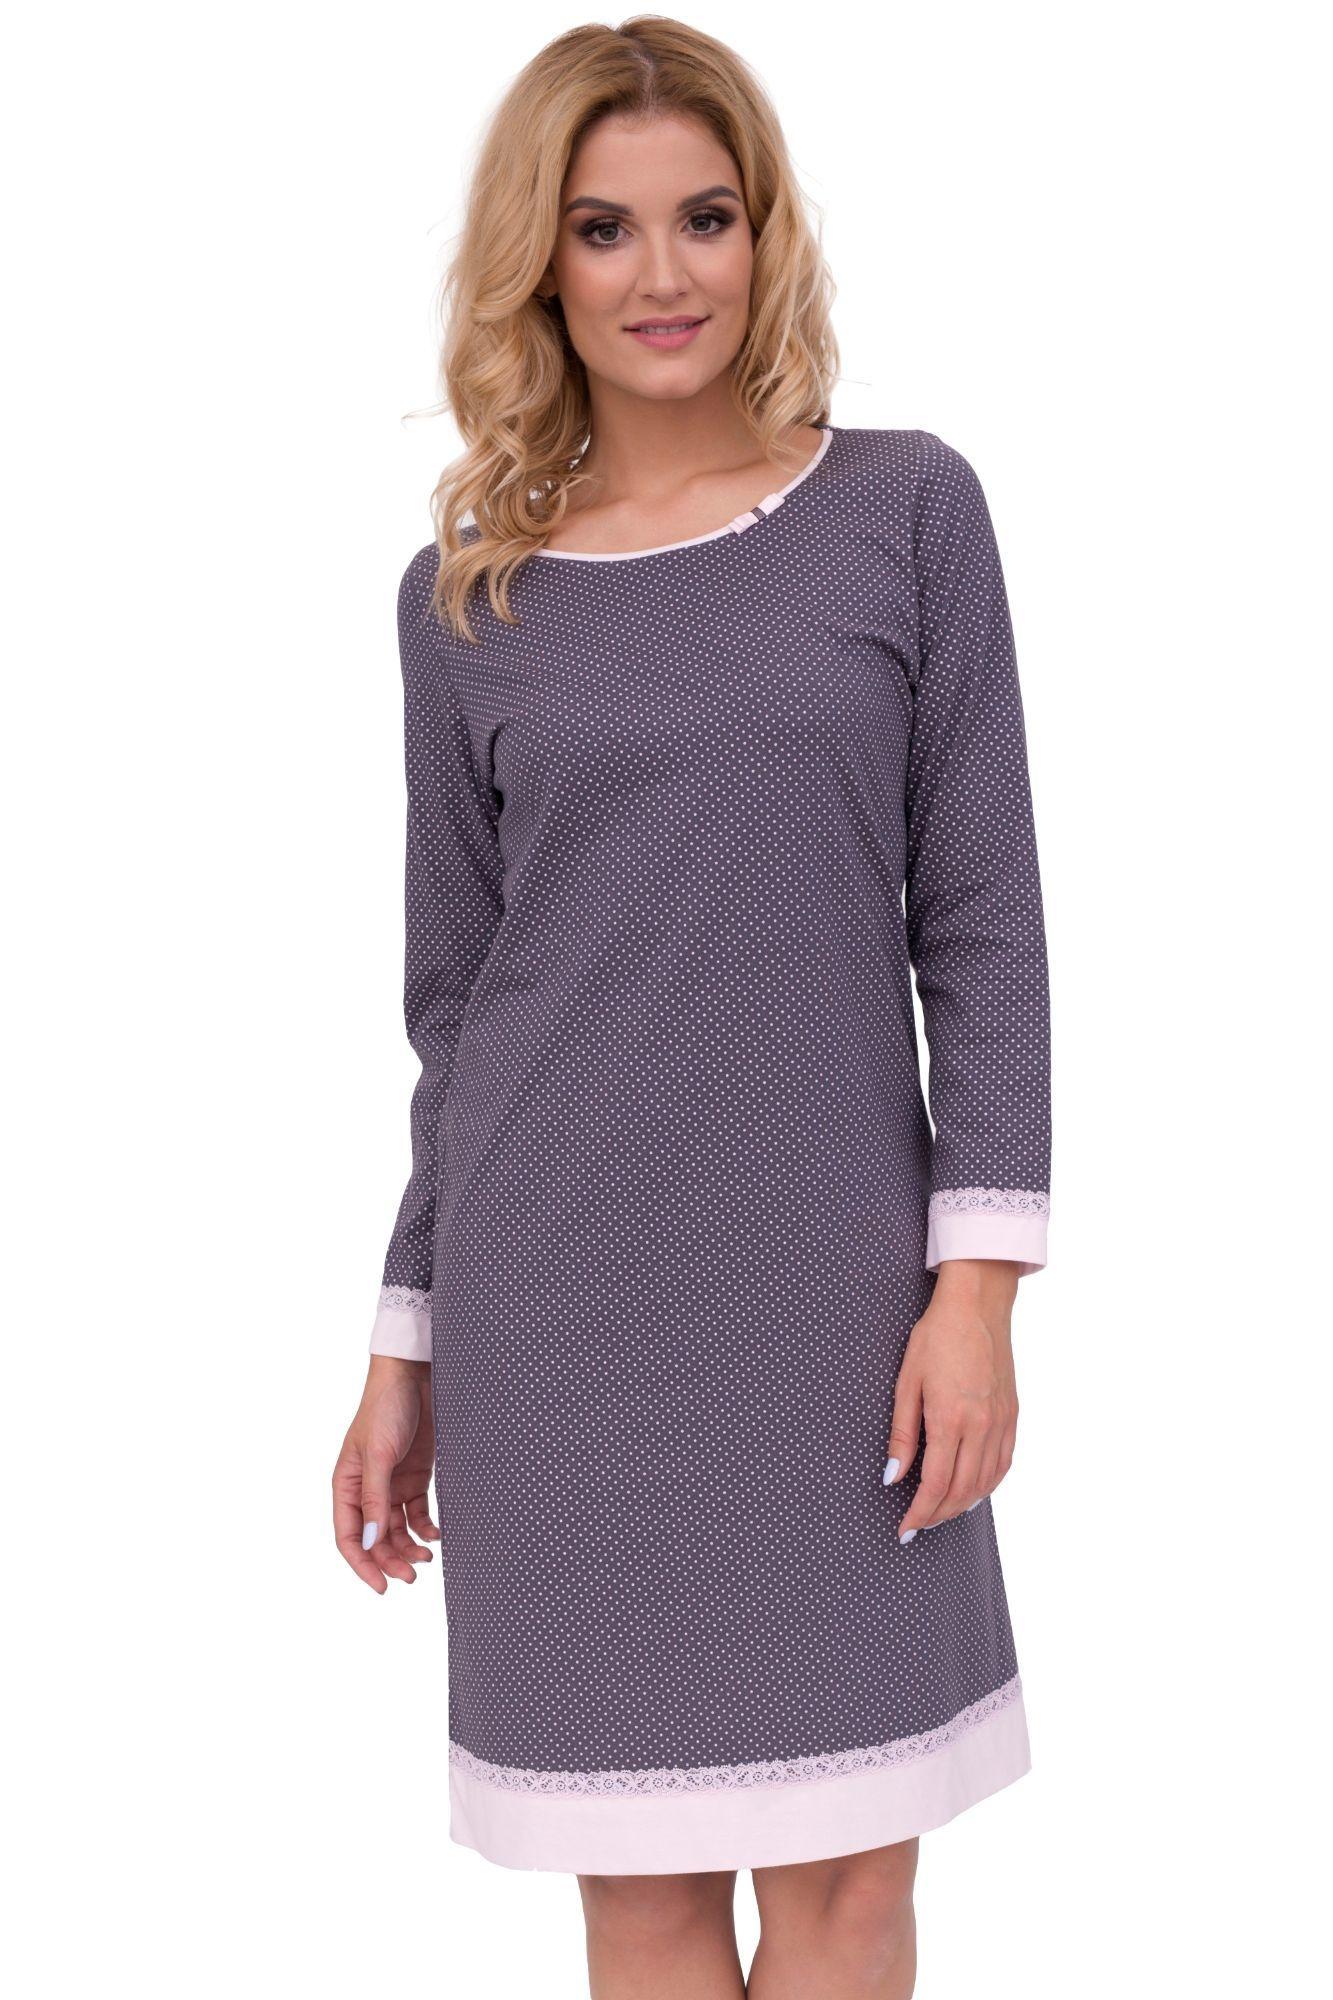 10e943a7d21c Luxusná dámska nočná košeľa Iva bodky - ELEGANT.sk